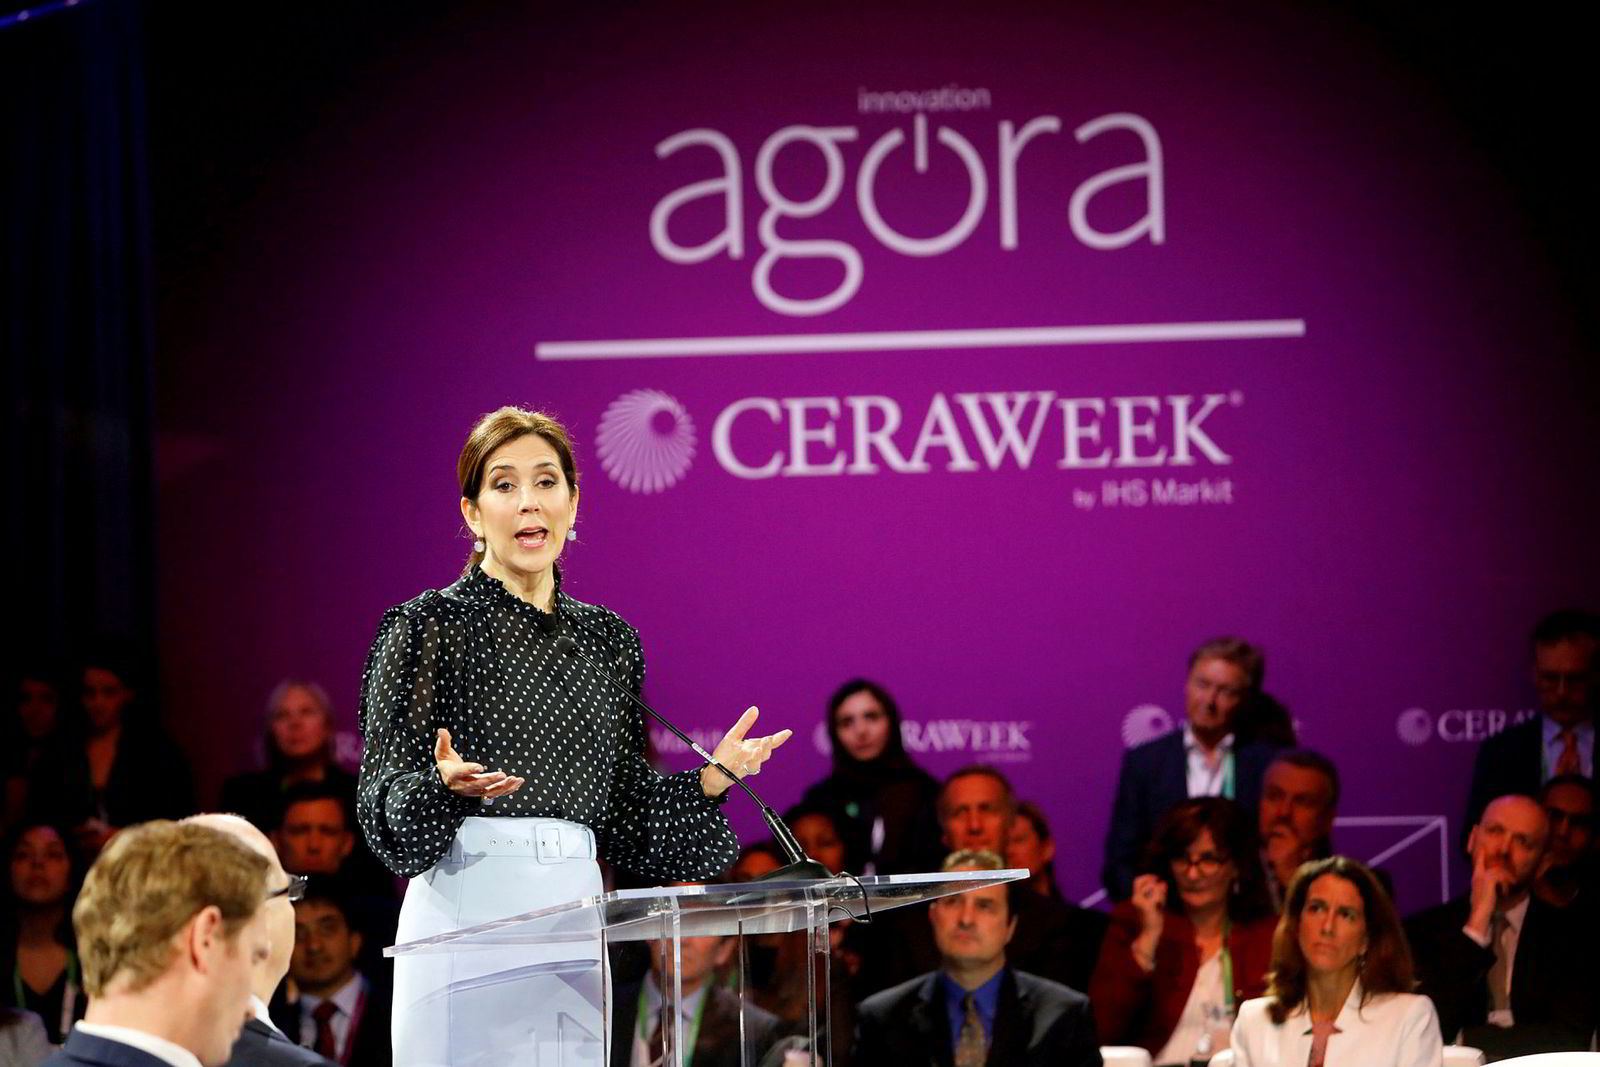 Danmarks kronprinsesse Mary var blant de inviterte talerne under fjorårets konferanse.